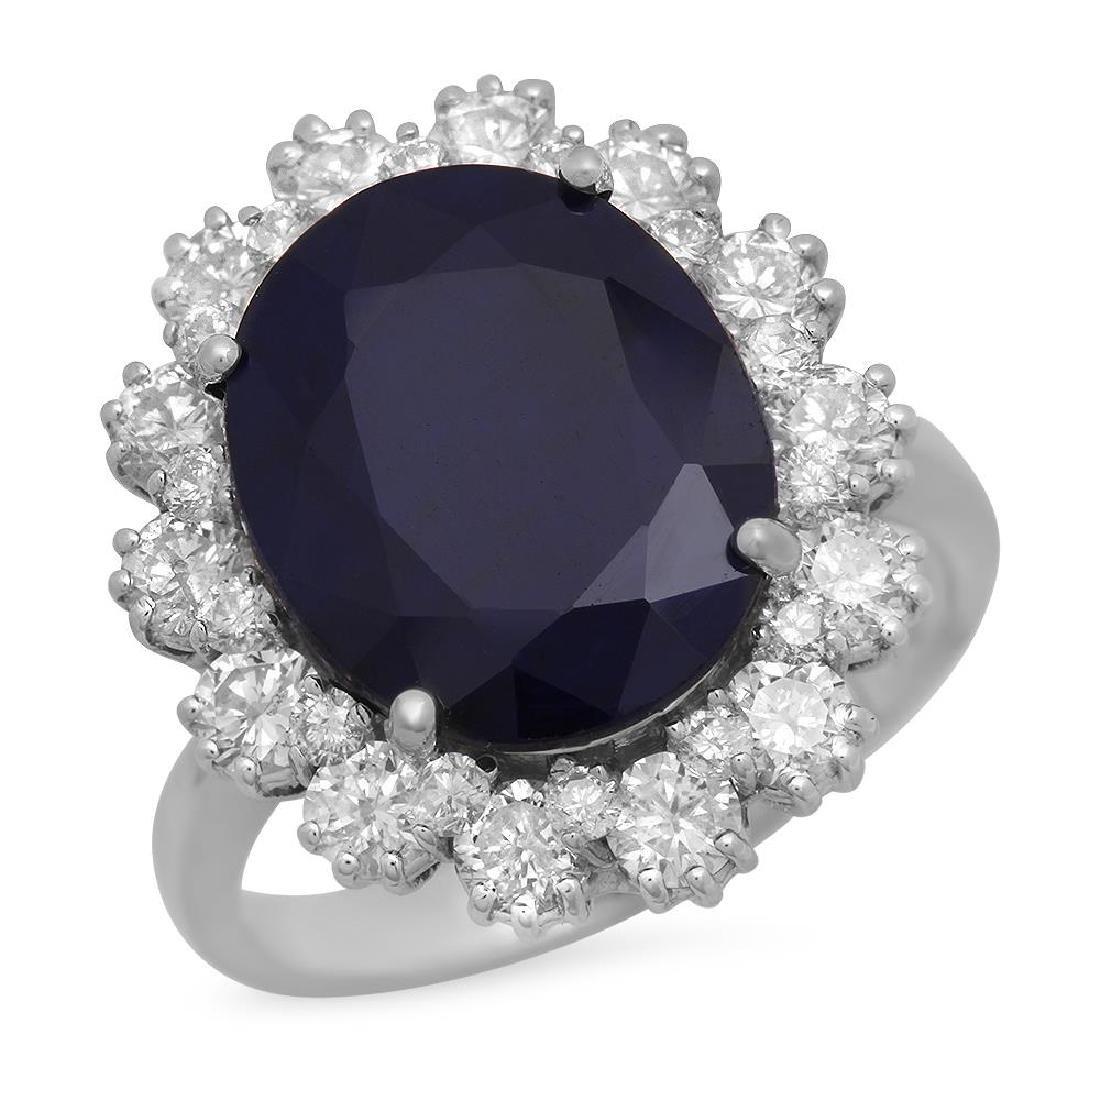 14K Gold 6.27ct Sapphire 1.63ct Diamond Ring